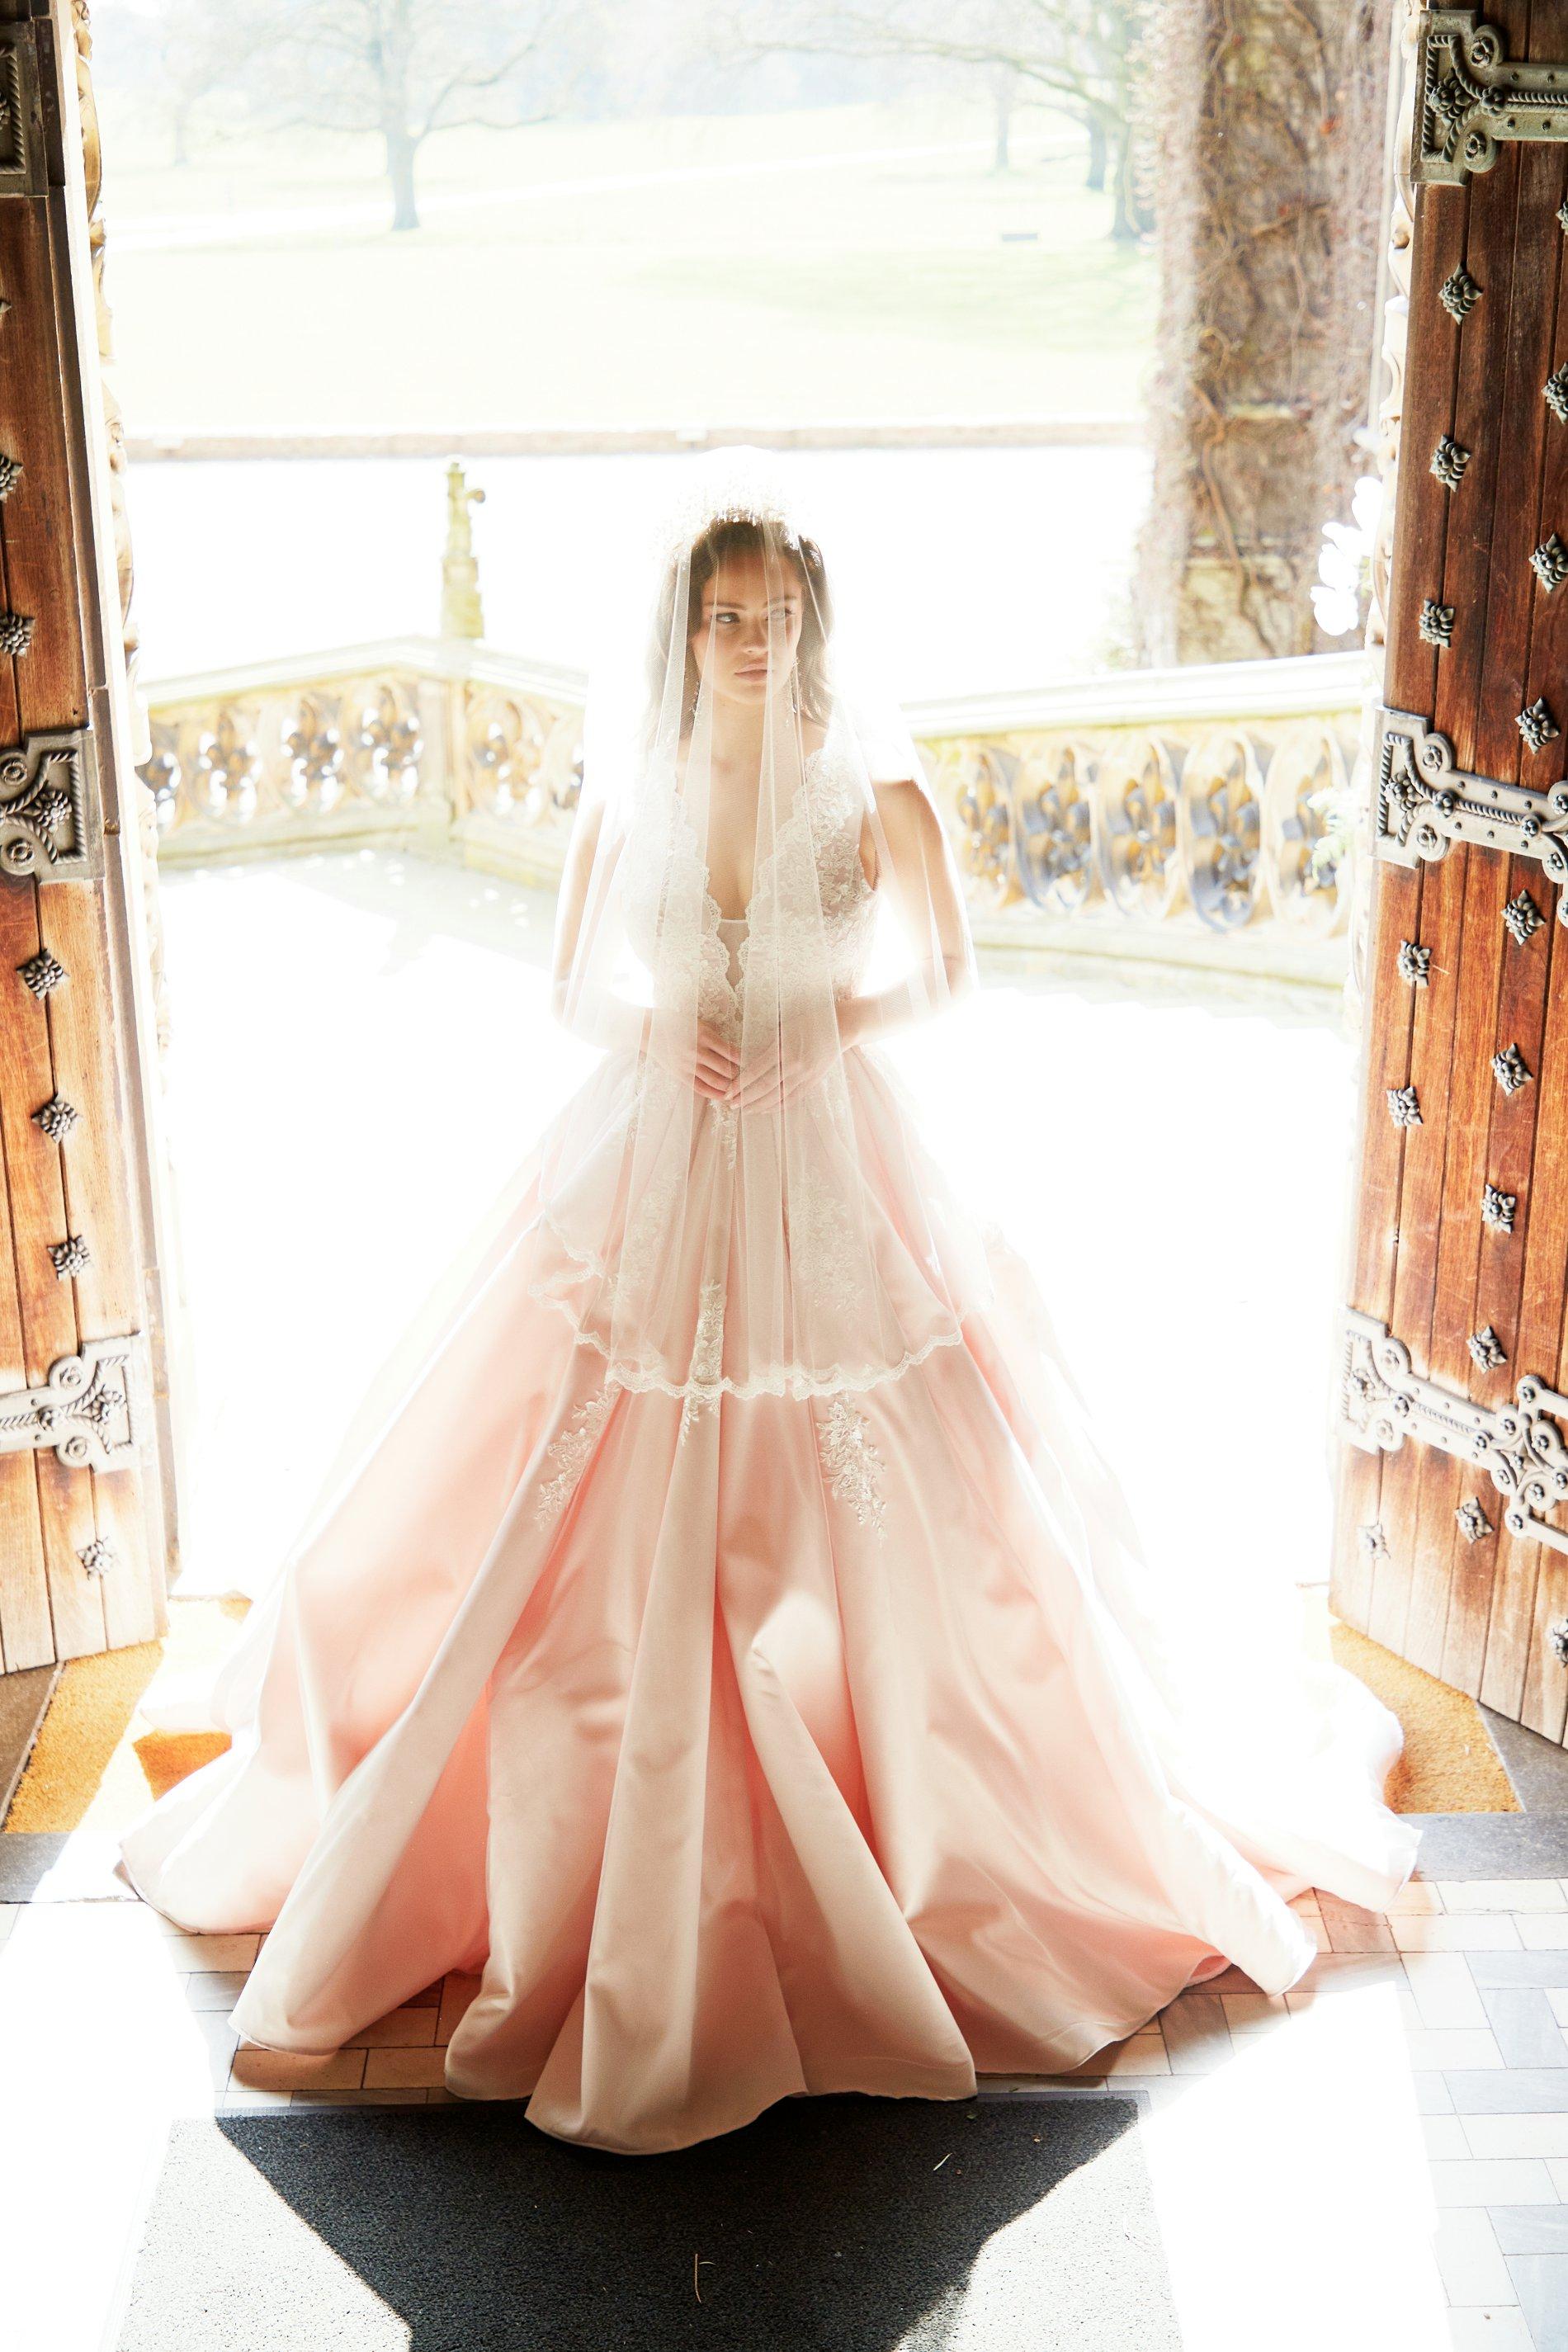 Danielle Sykes Bridal Designs (26)